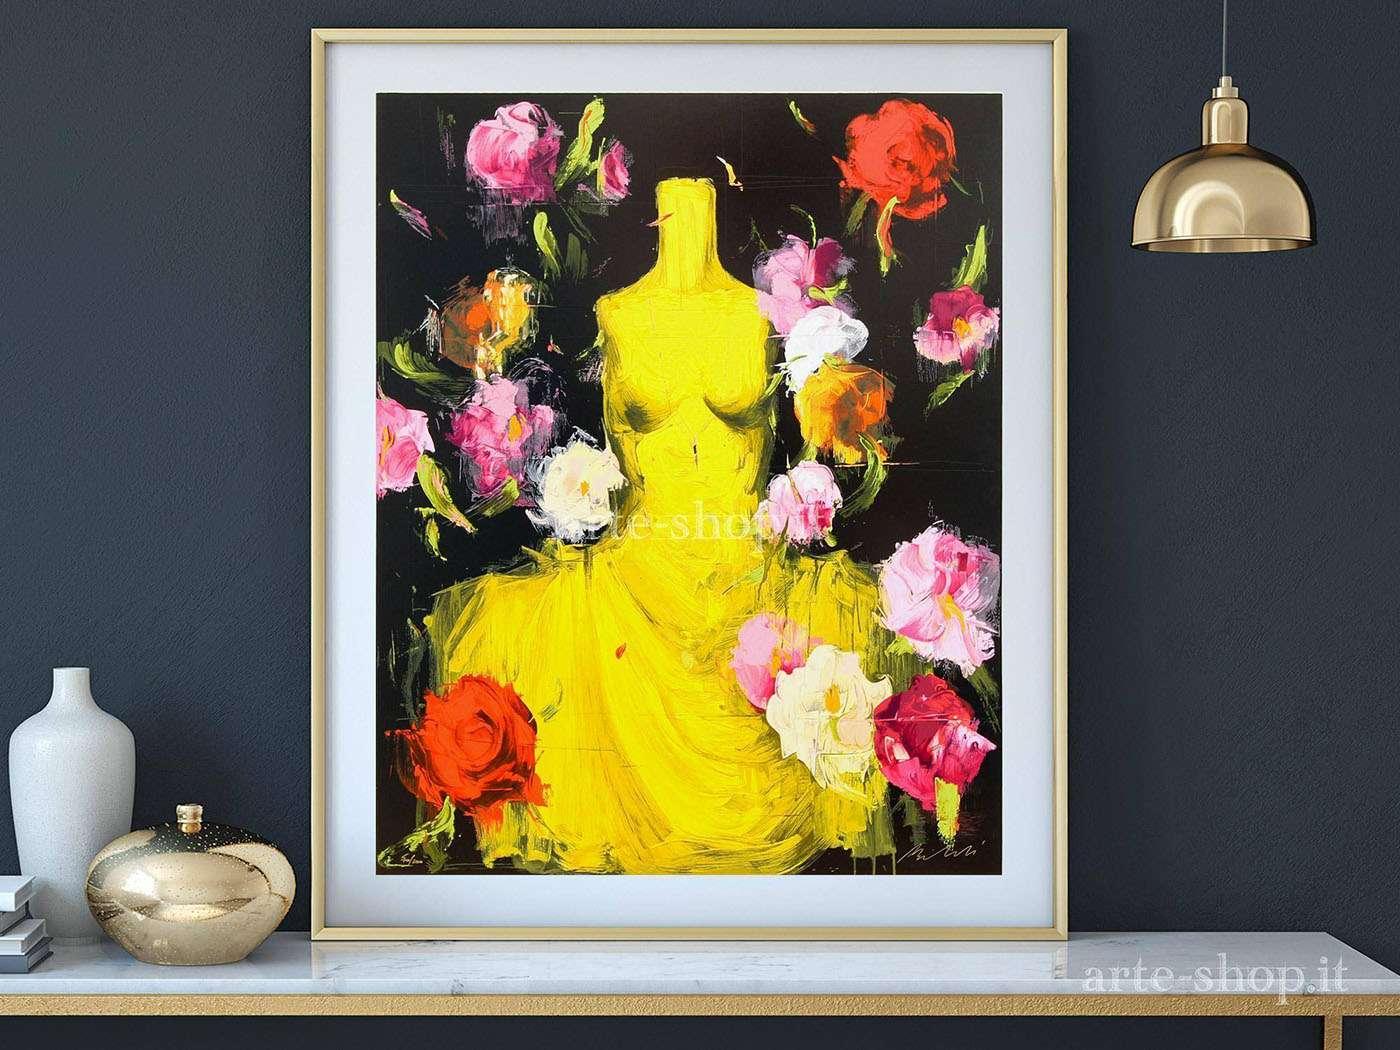 Serigrafia Luca Bellan- Yellow dress